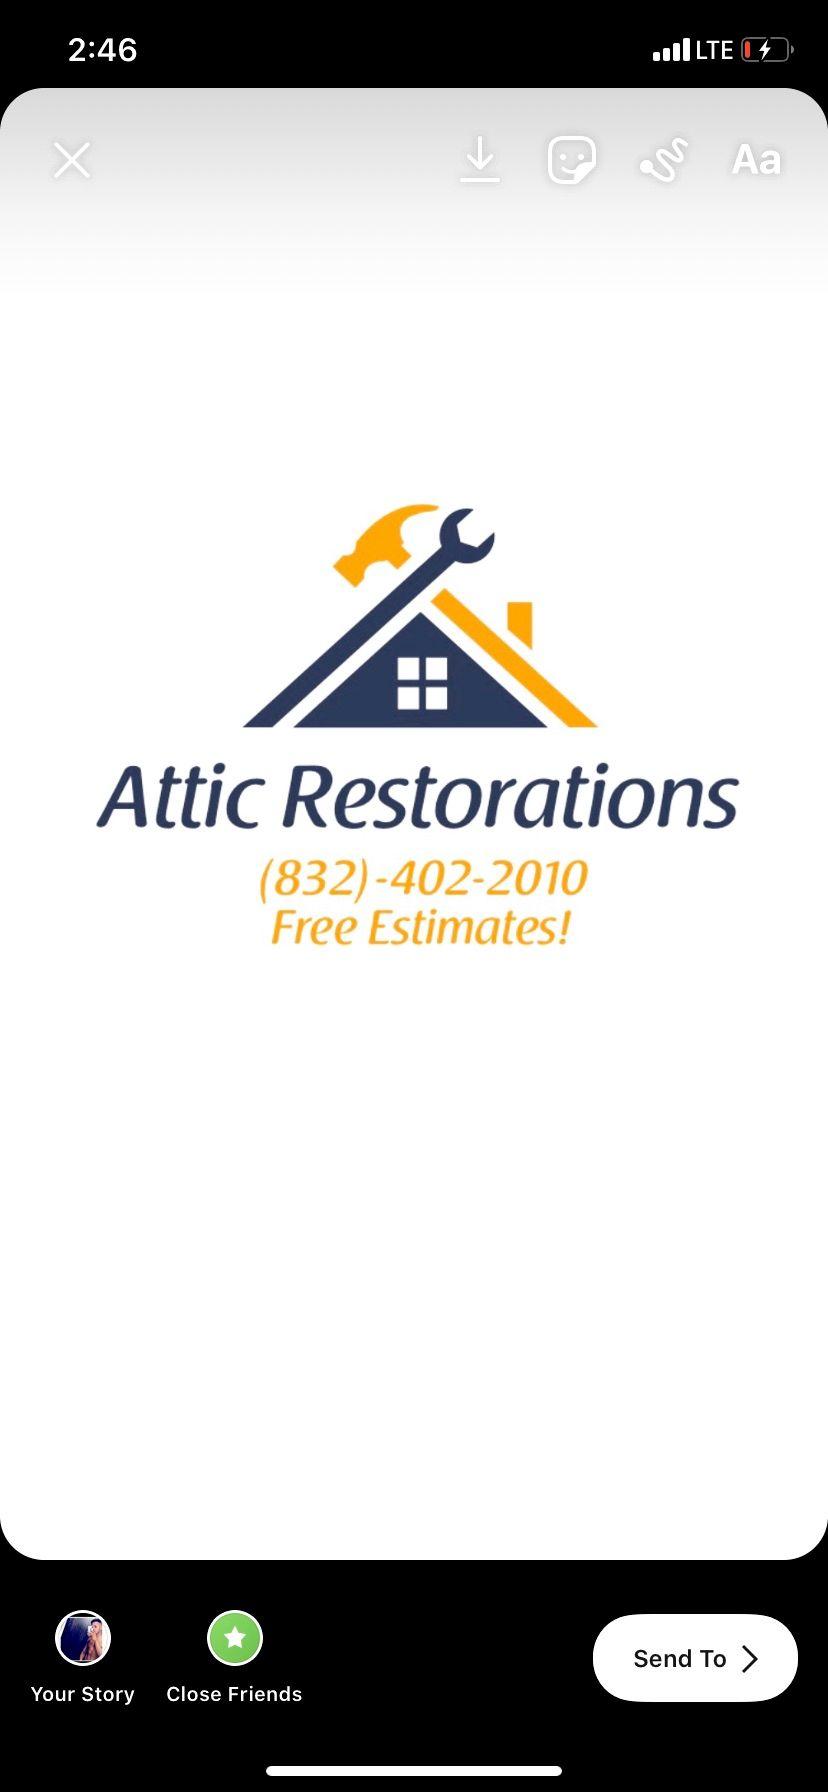 Attic Restorations